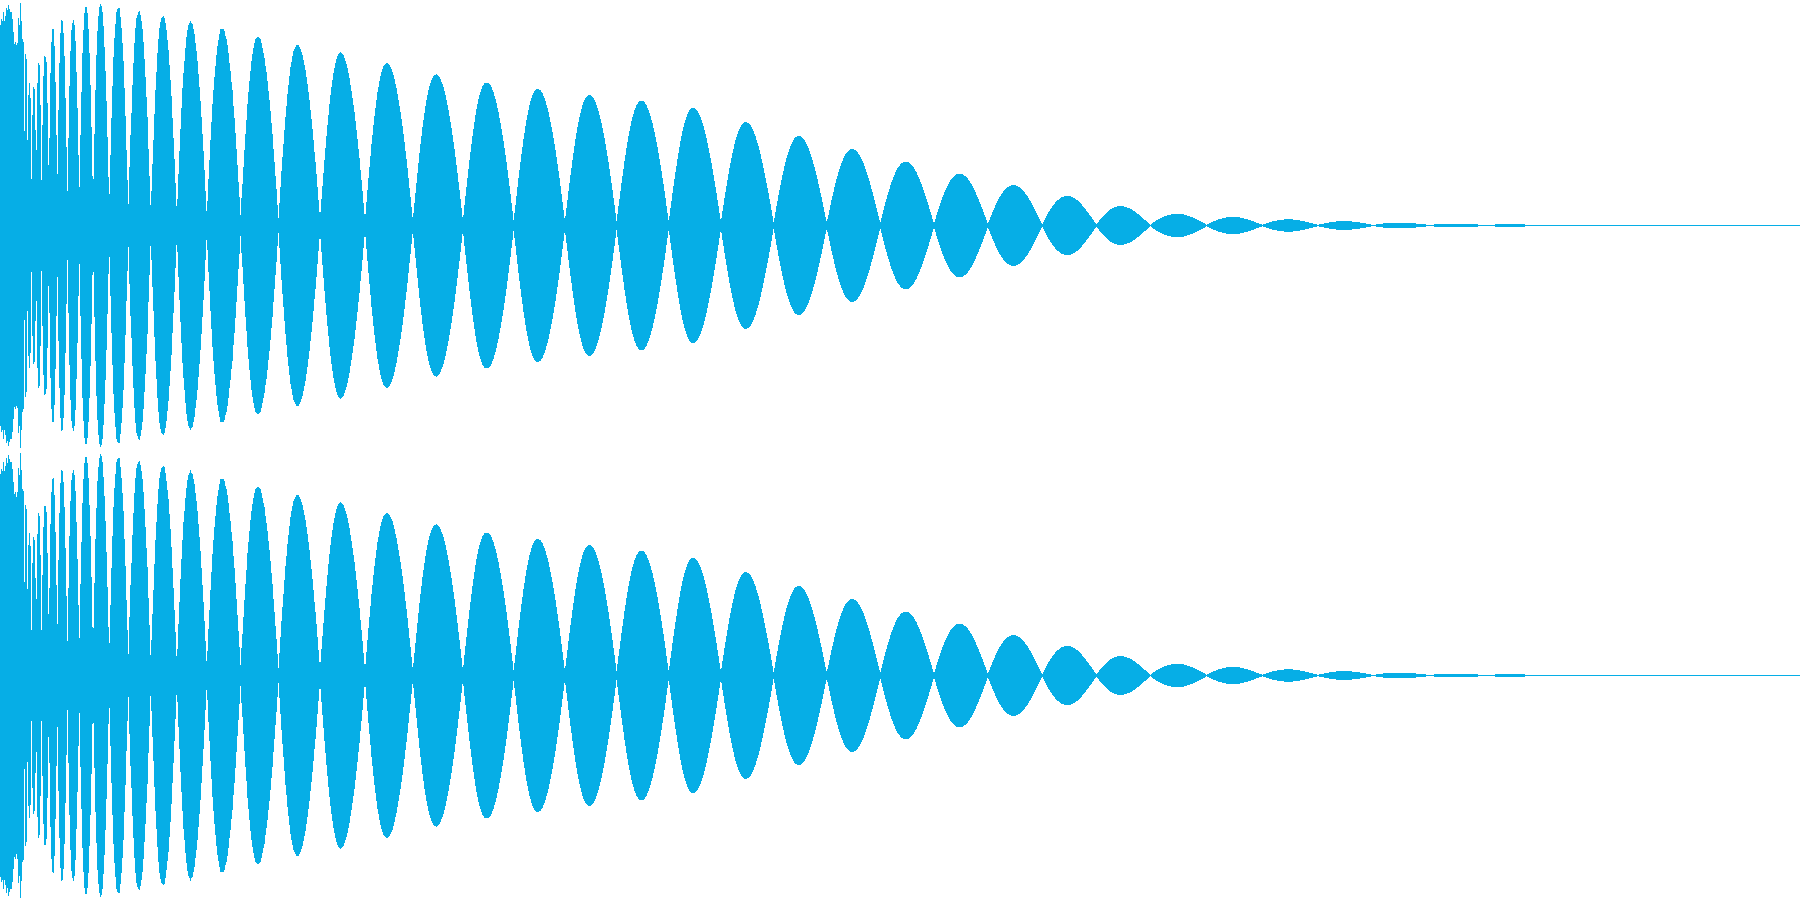 DTM Kick 26 オリジナル音源の再生済みの波形